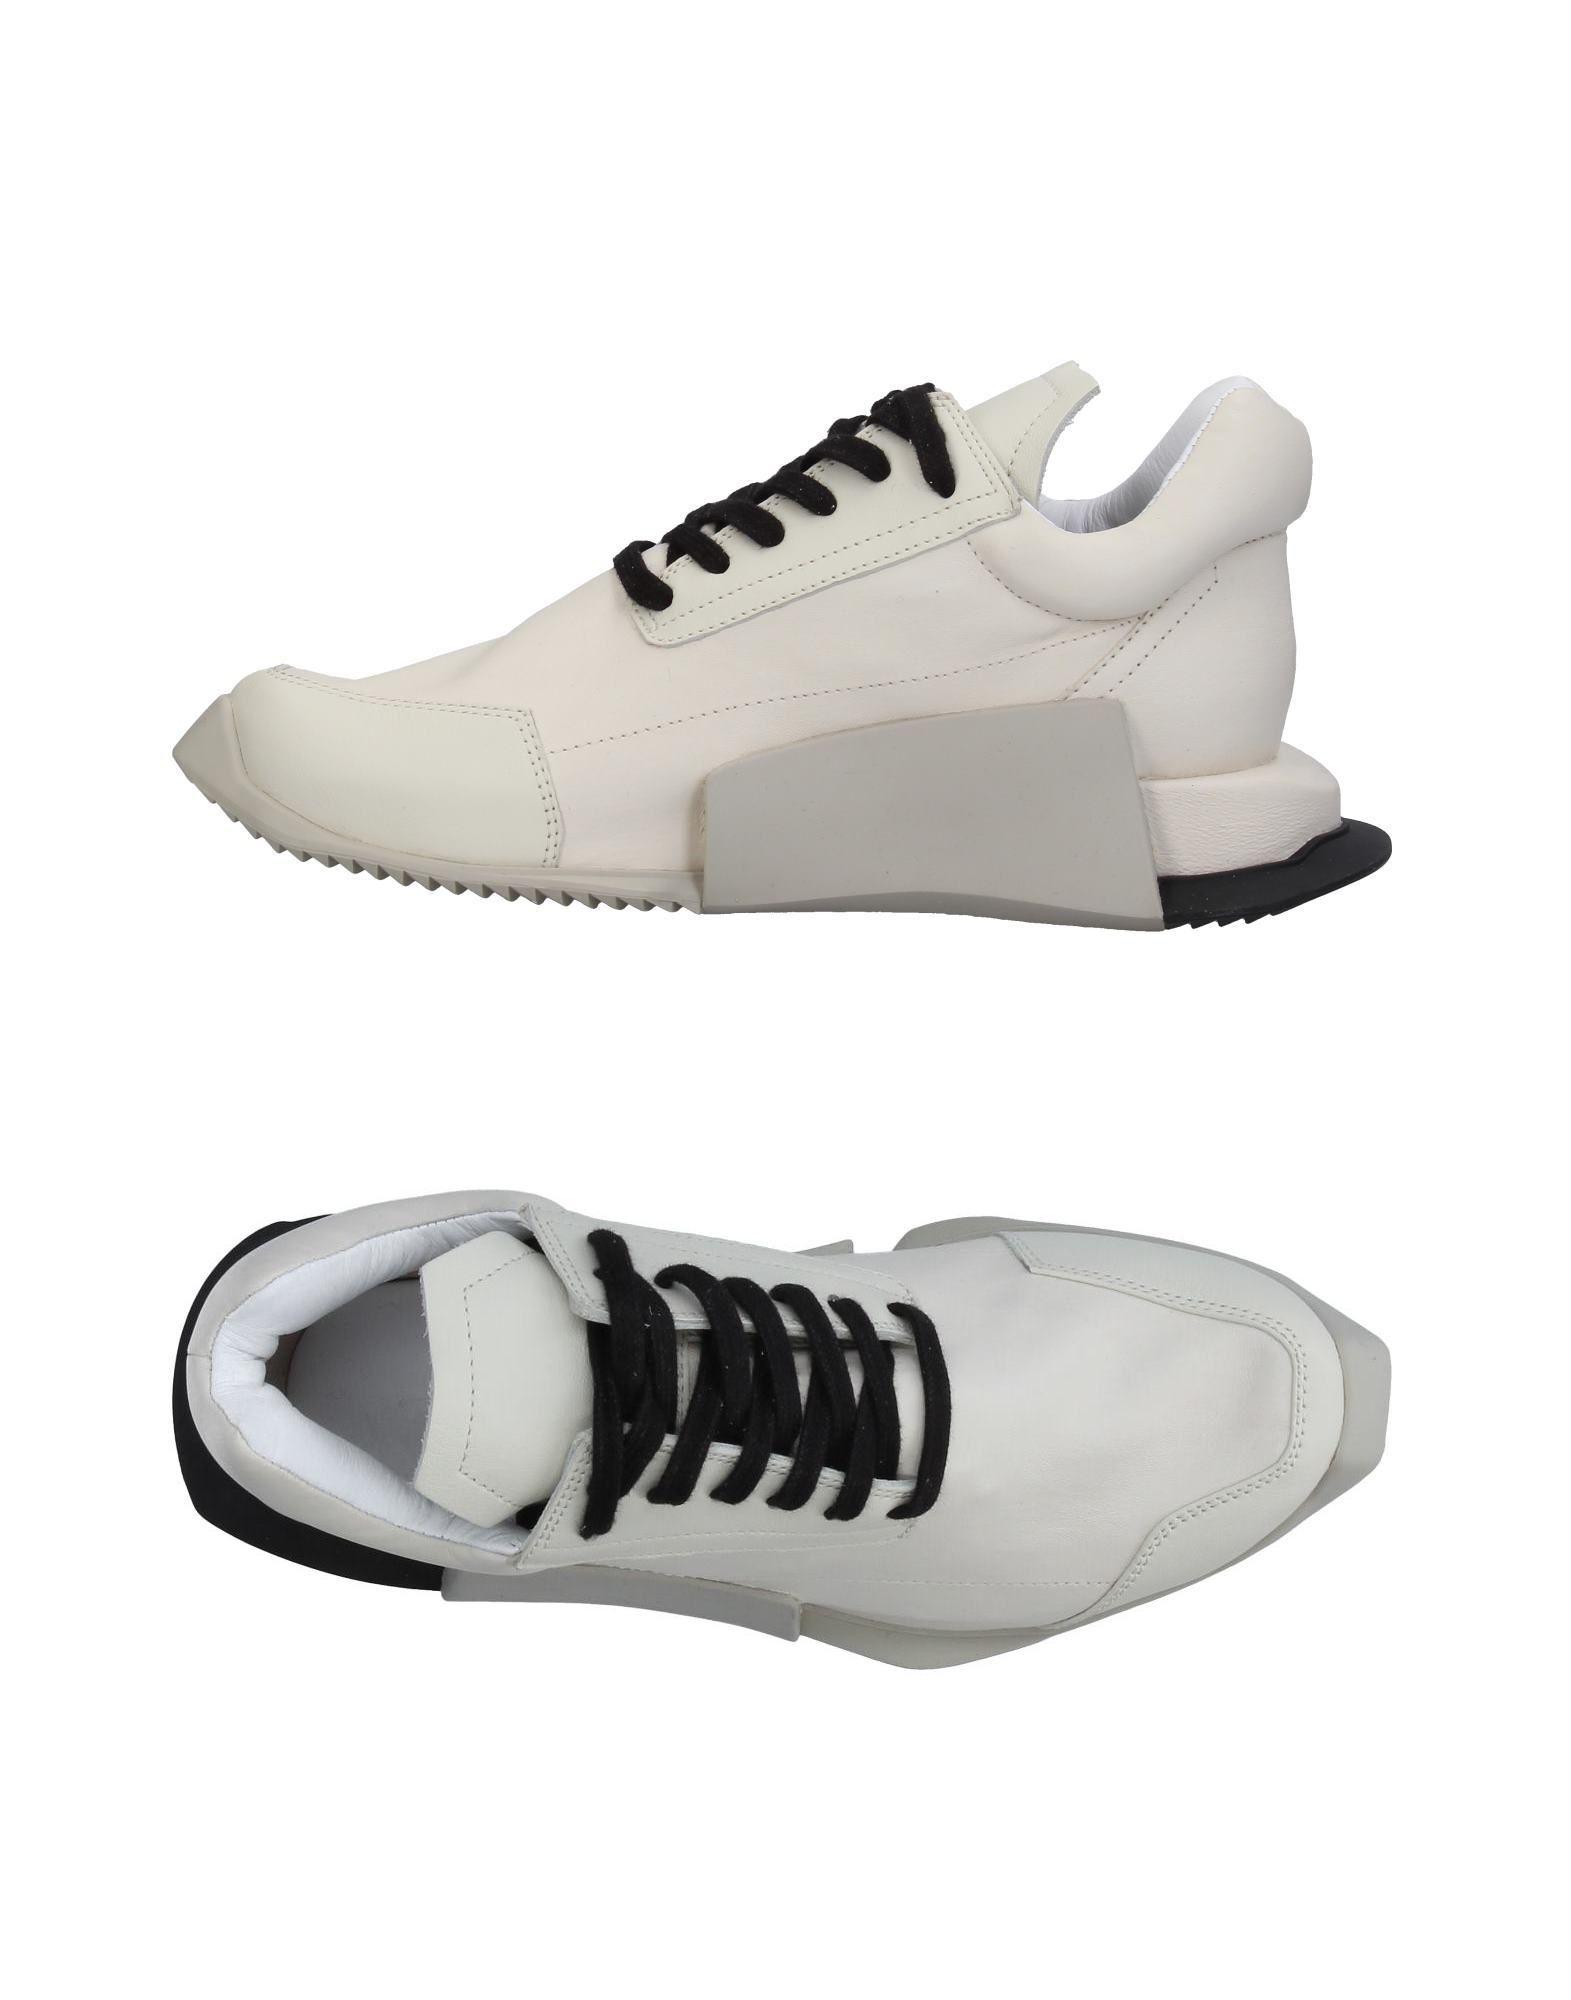 Rick Owens X Adidas Sneakers Sneakers Sneakers - Women Rick Owens X Adidas Sneakers online on  United Kingdom - 11356781LN c7ac2f